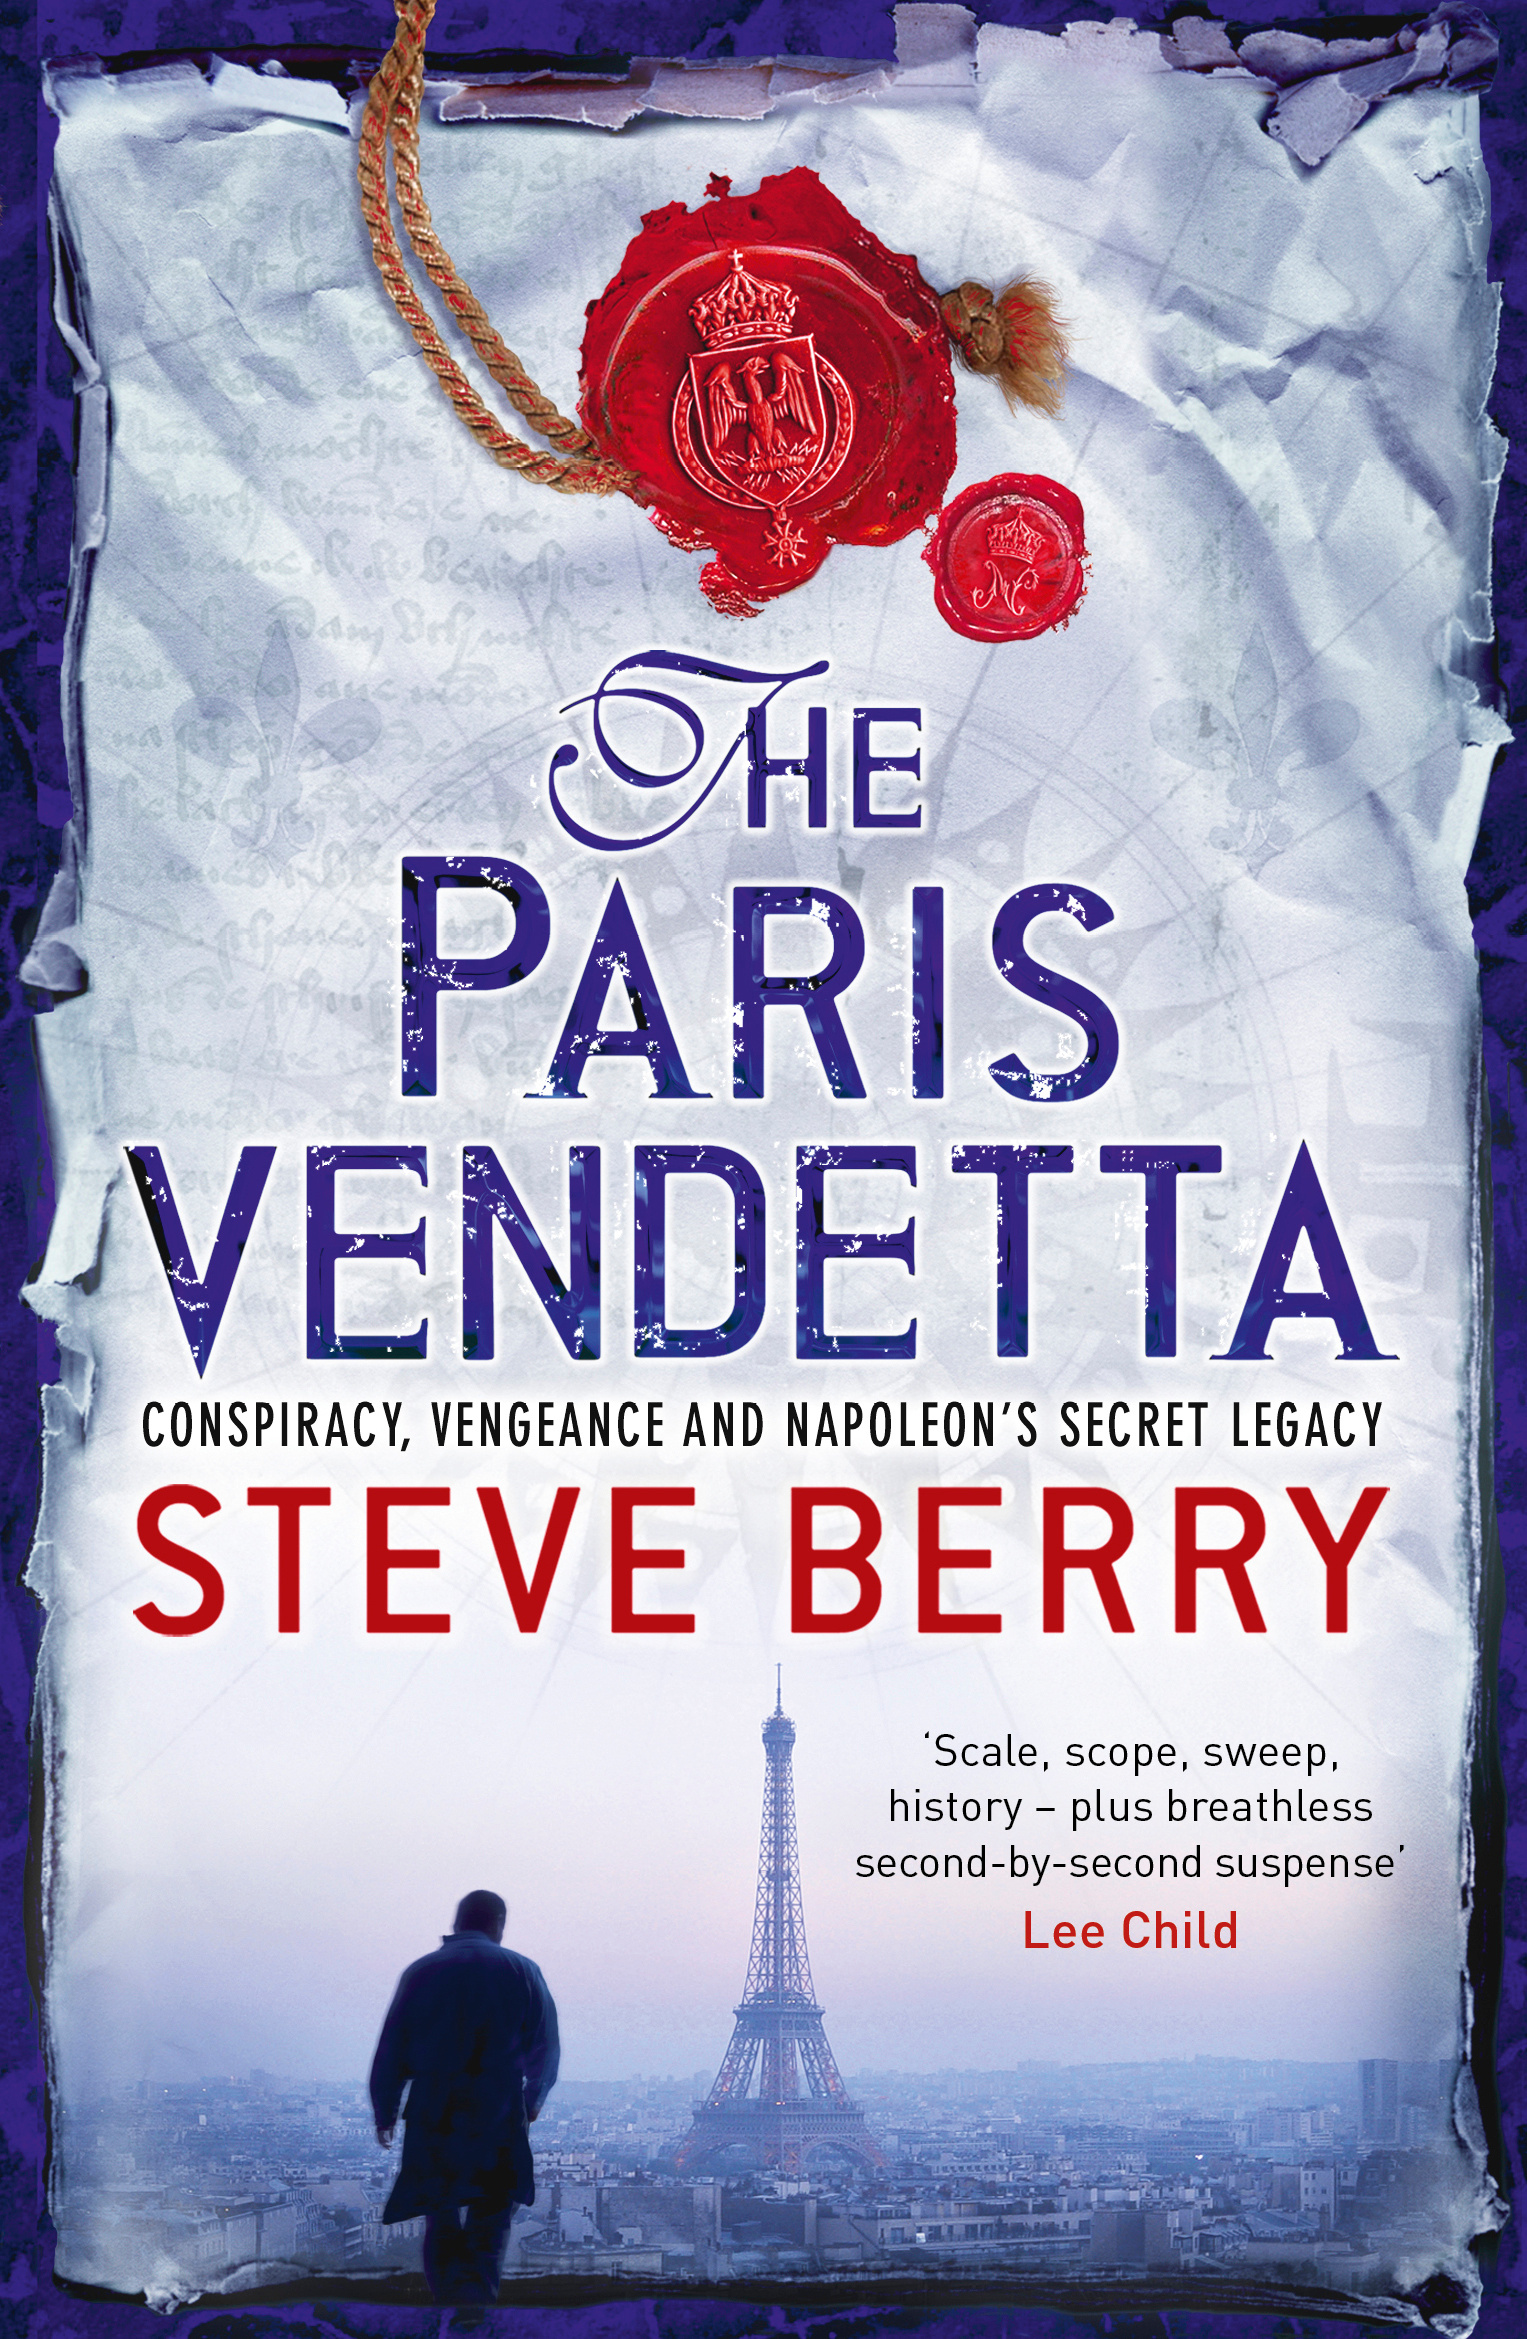 Books steve berry the paris vendetta download image download image